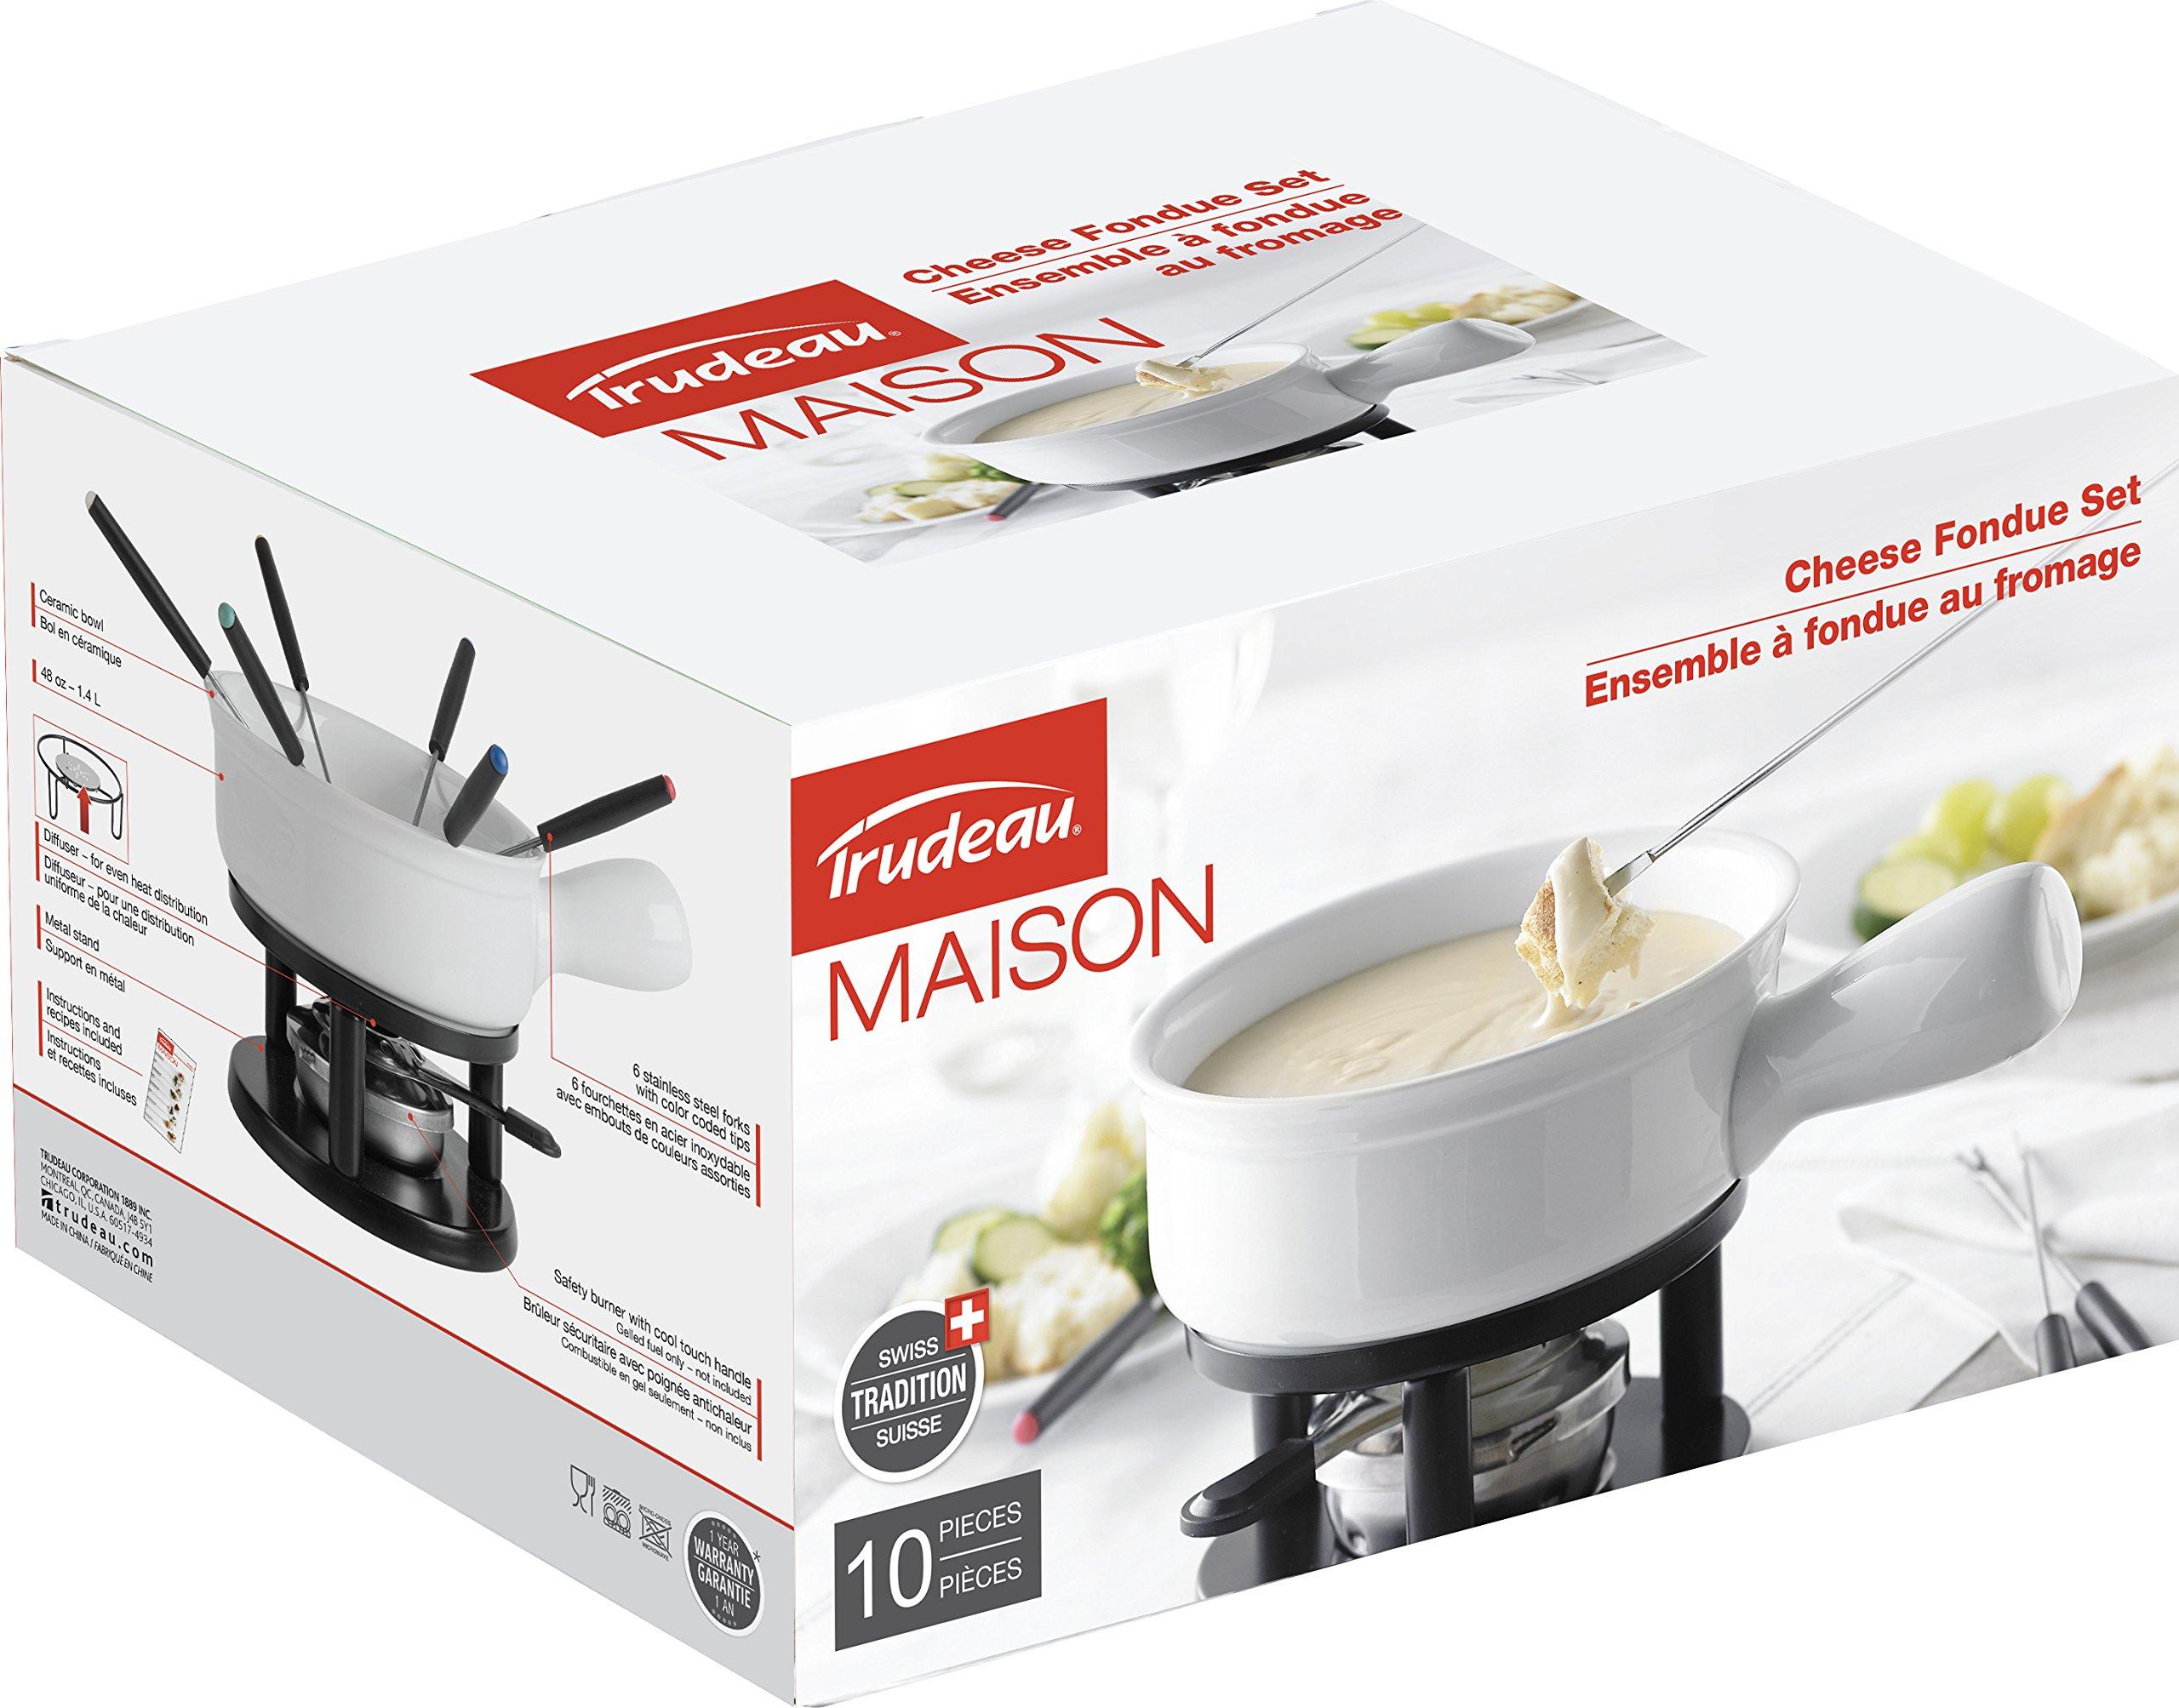 Trudeau Maison Classico 10 piece Cheese Fondue Set - 48 ounce